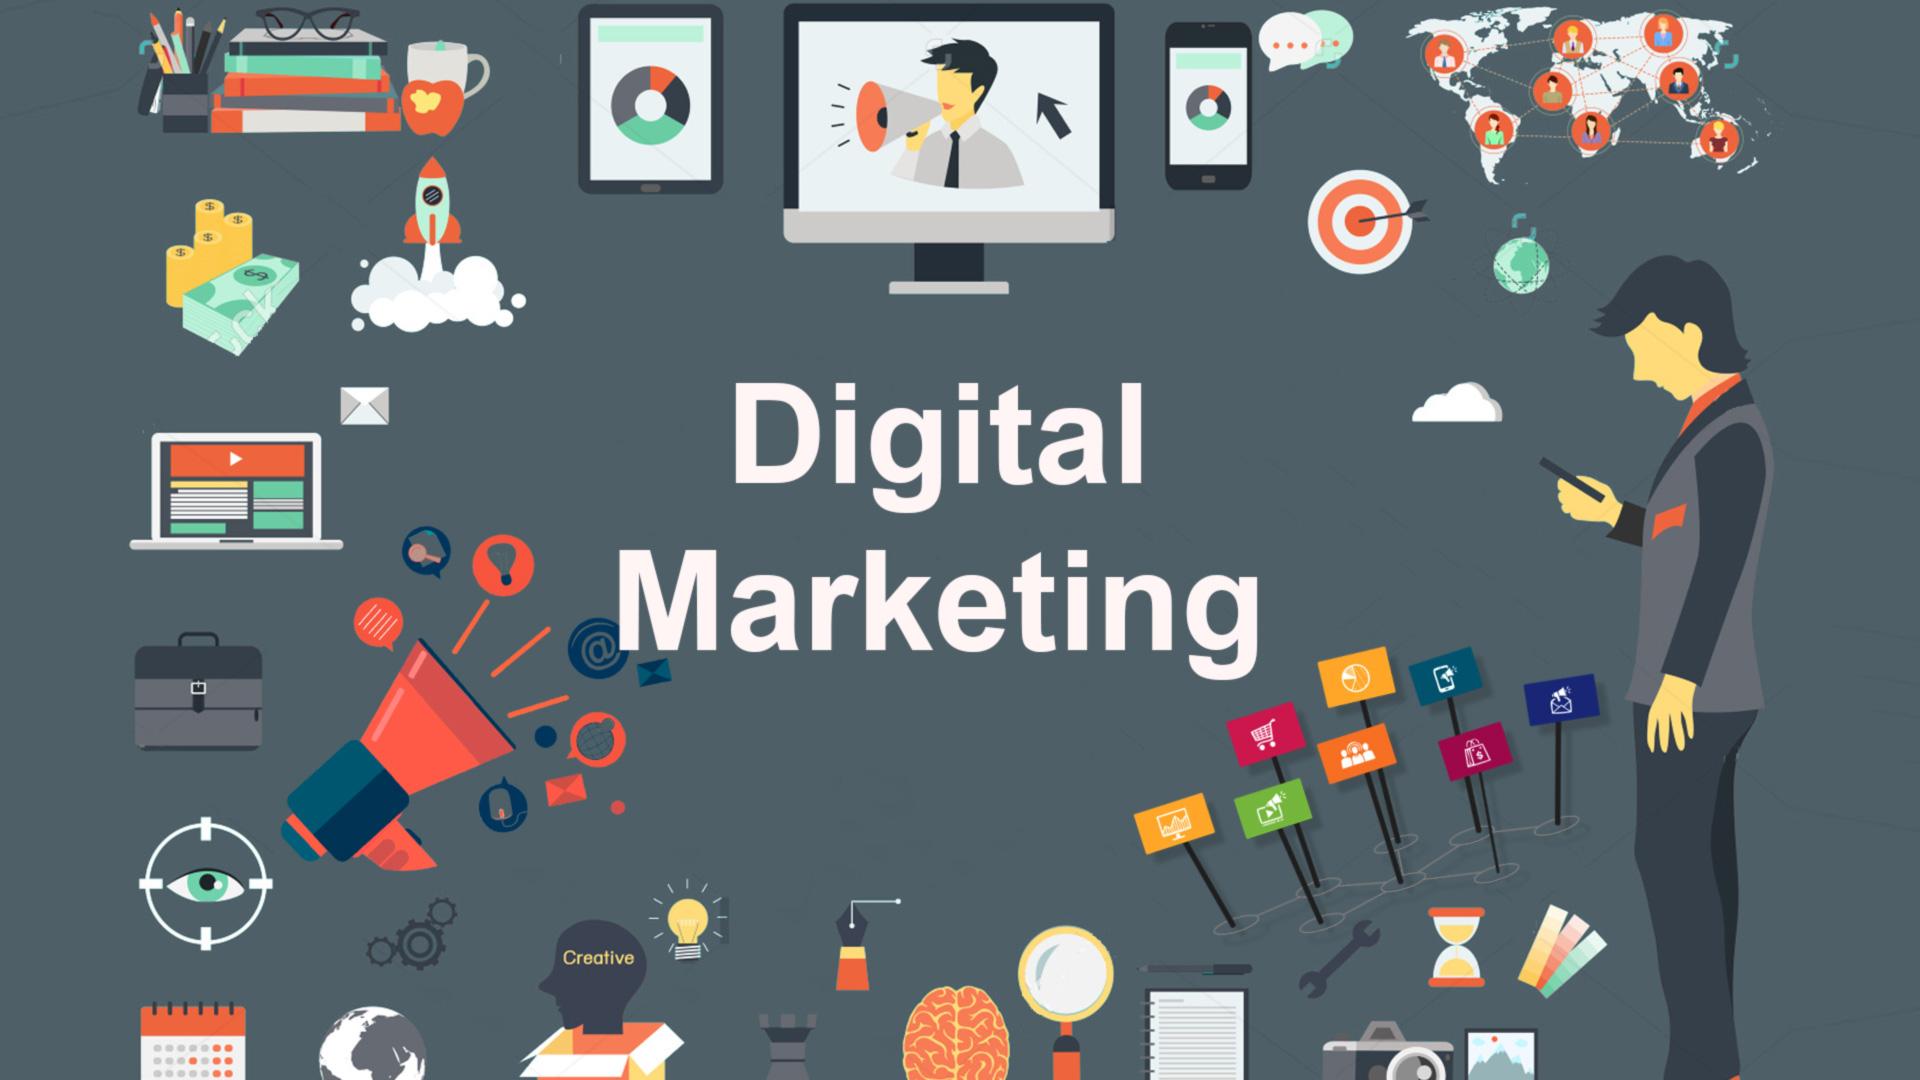 Top 5 Digital Marketing Trends in 2018